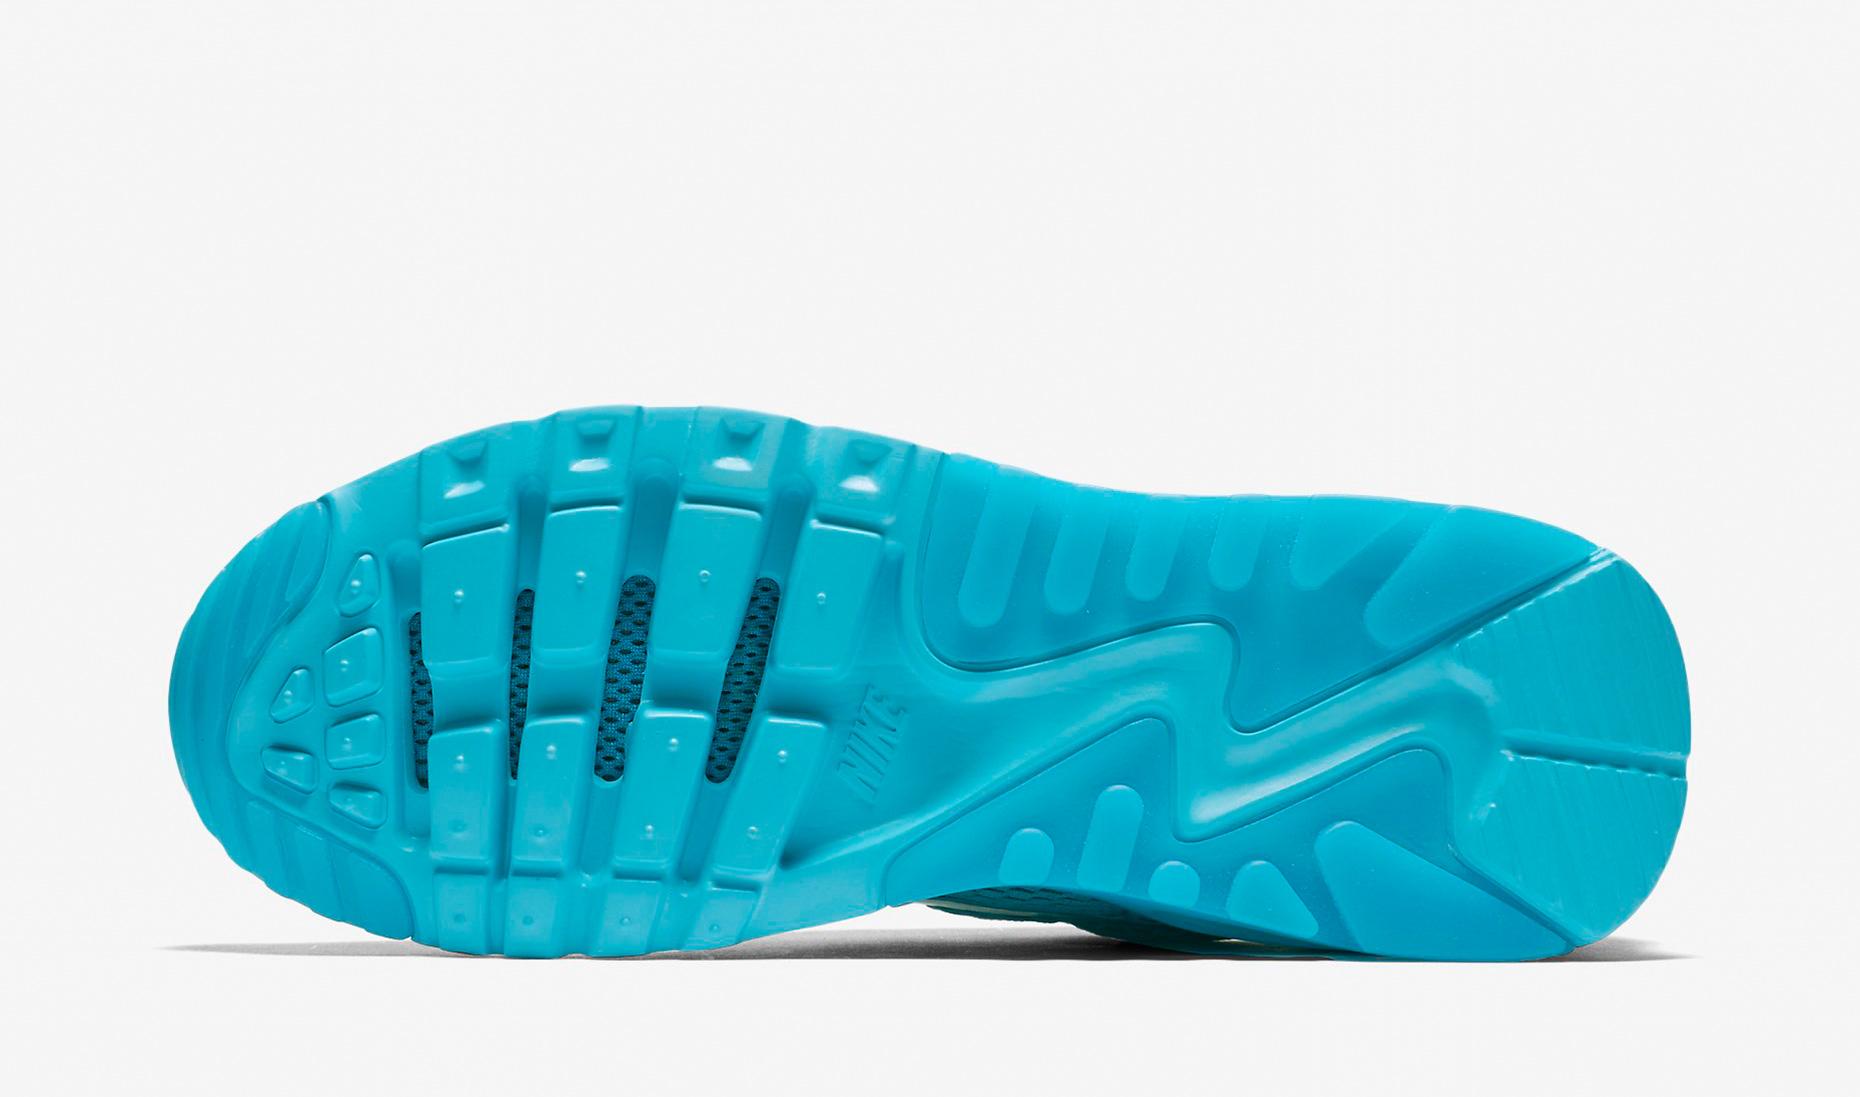 nike-air-max-90-ultra-br-gamma-blue-03